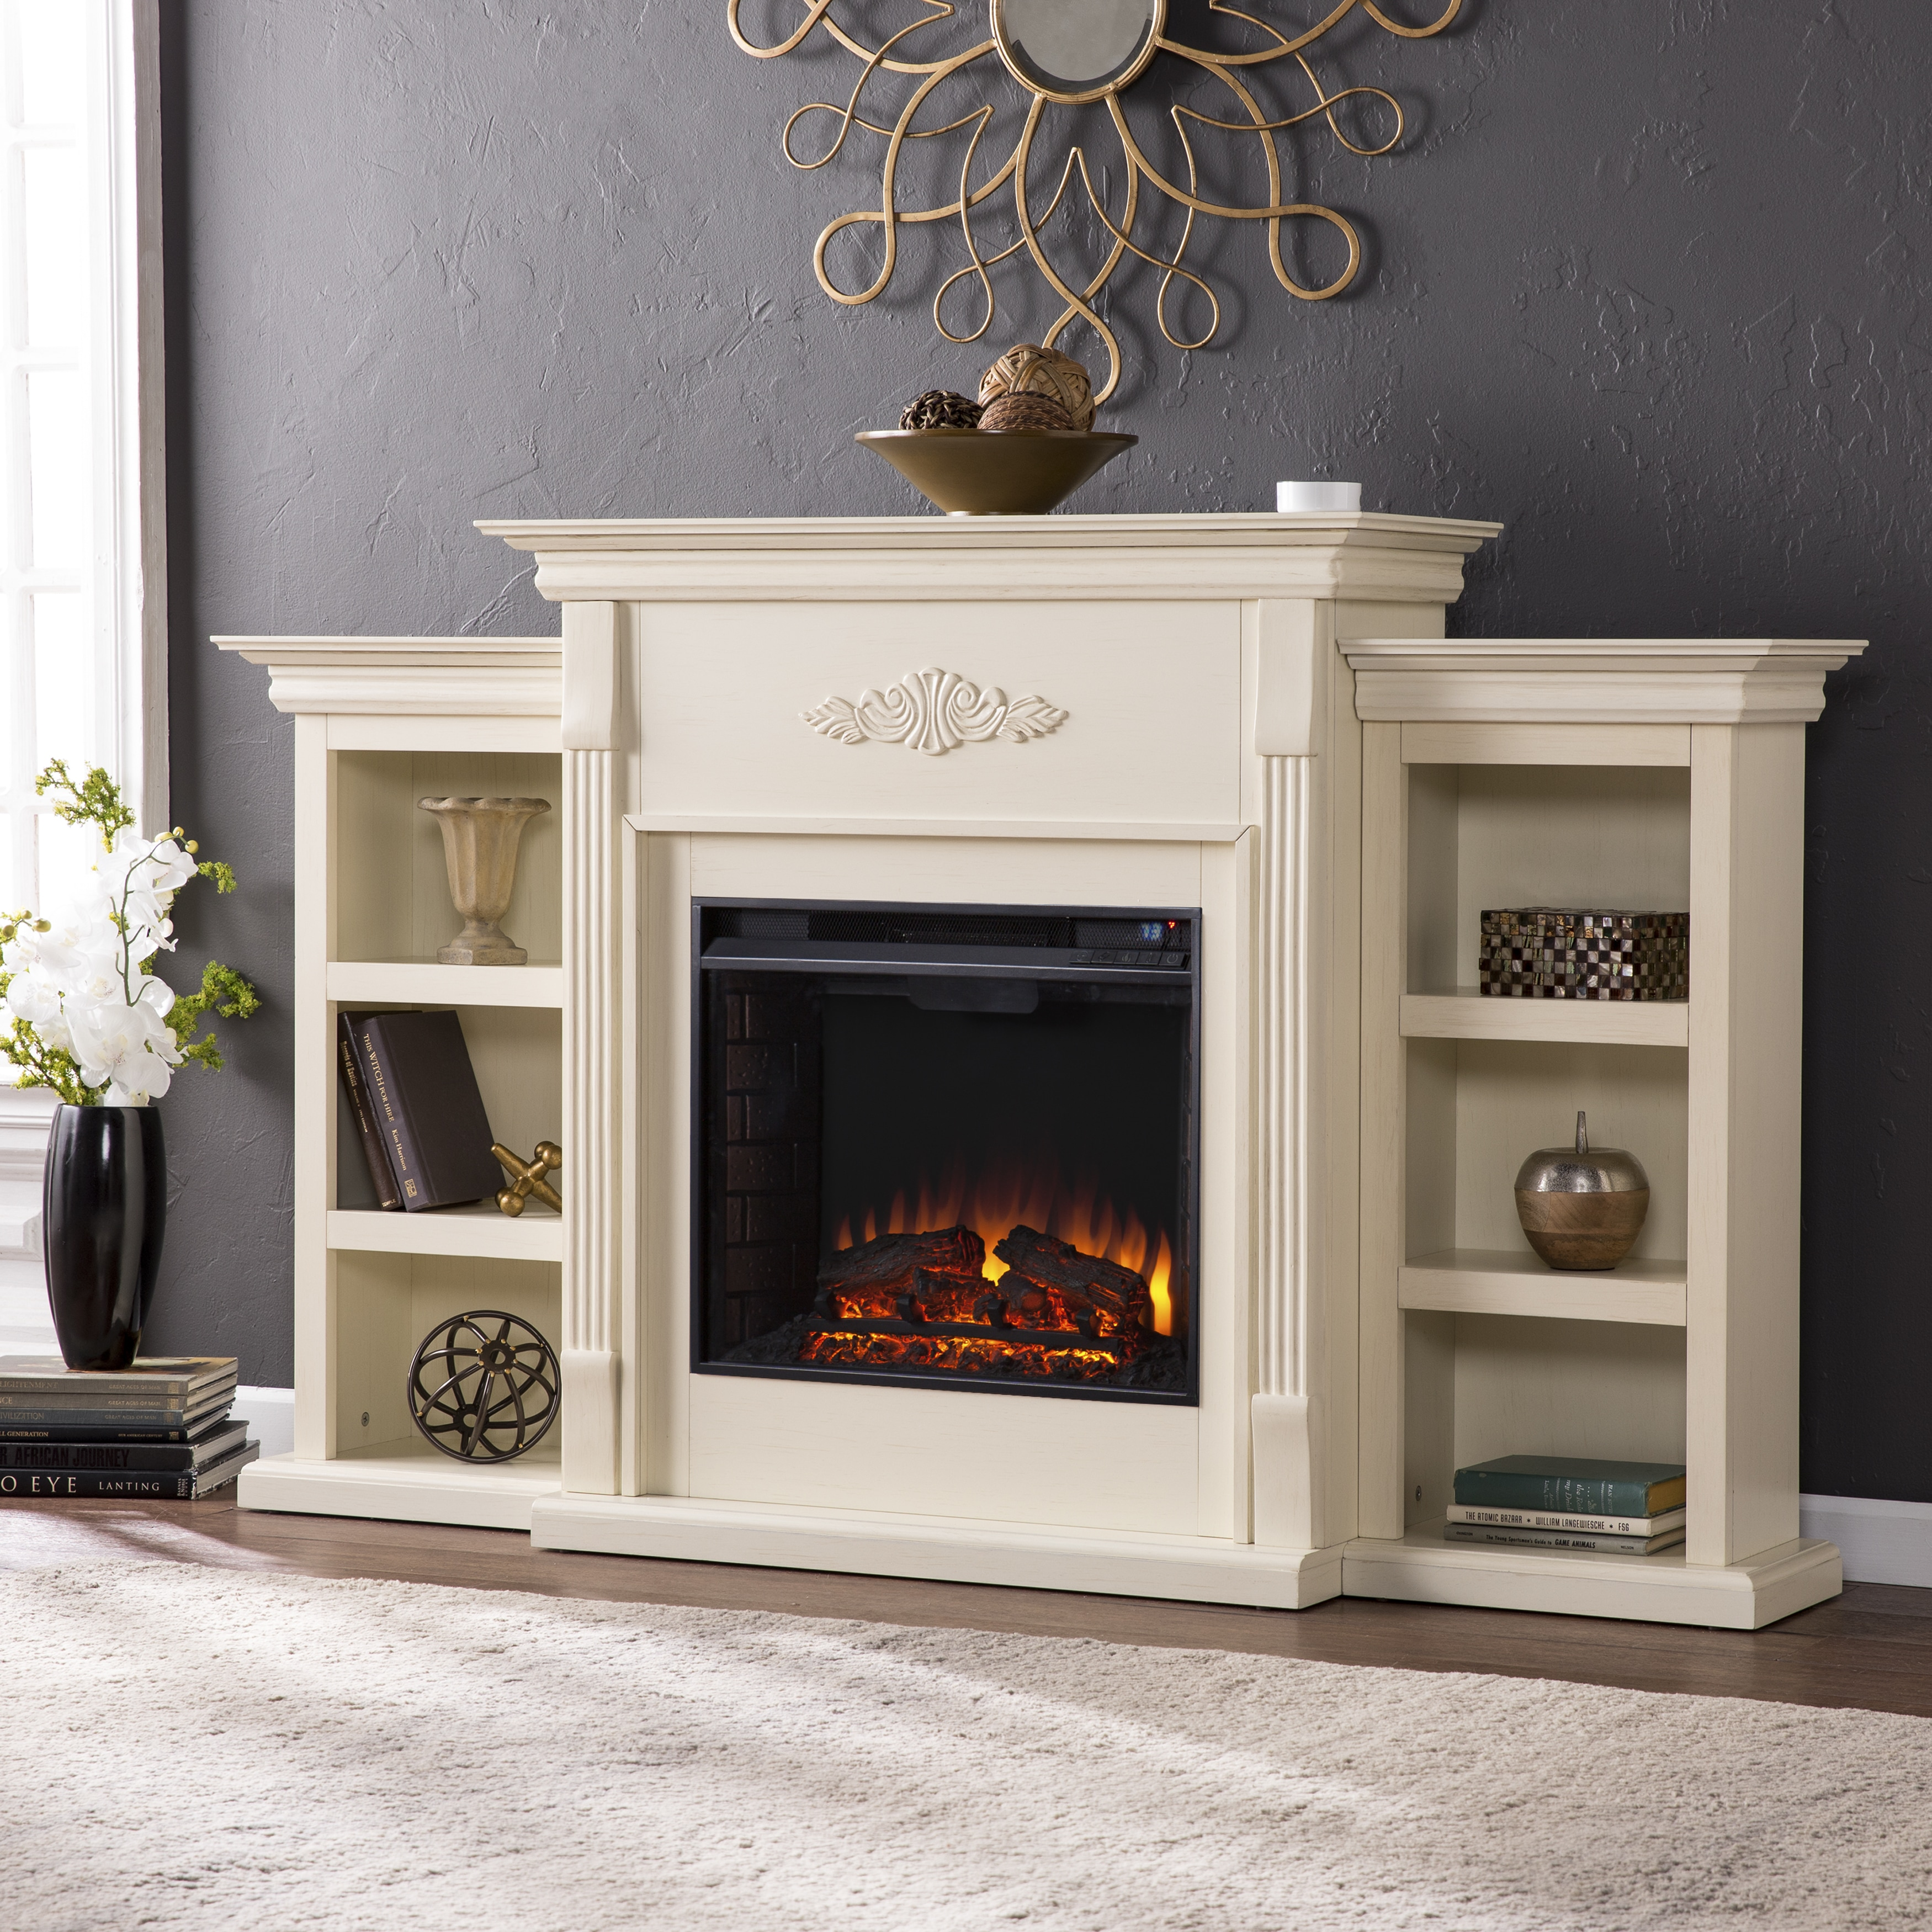 ivory electric fireplace tv stand w shelves fits 42. Black Bedroom Furniture Sets. Home Design Ideas